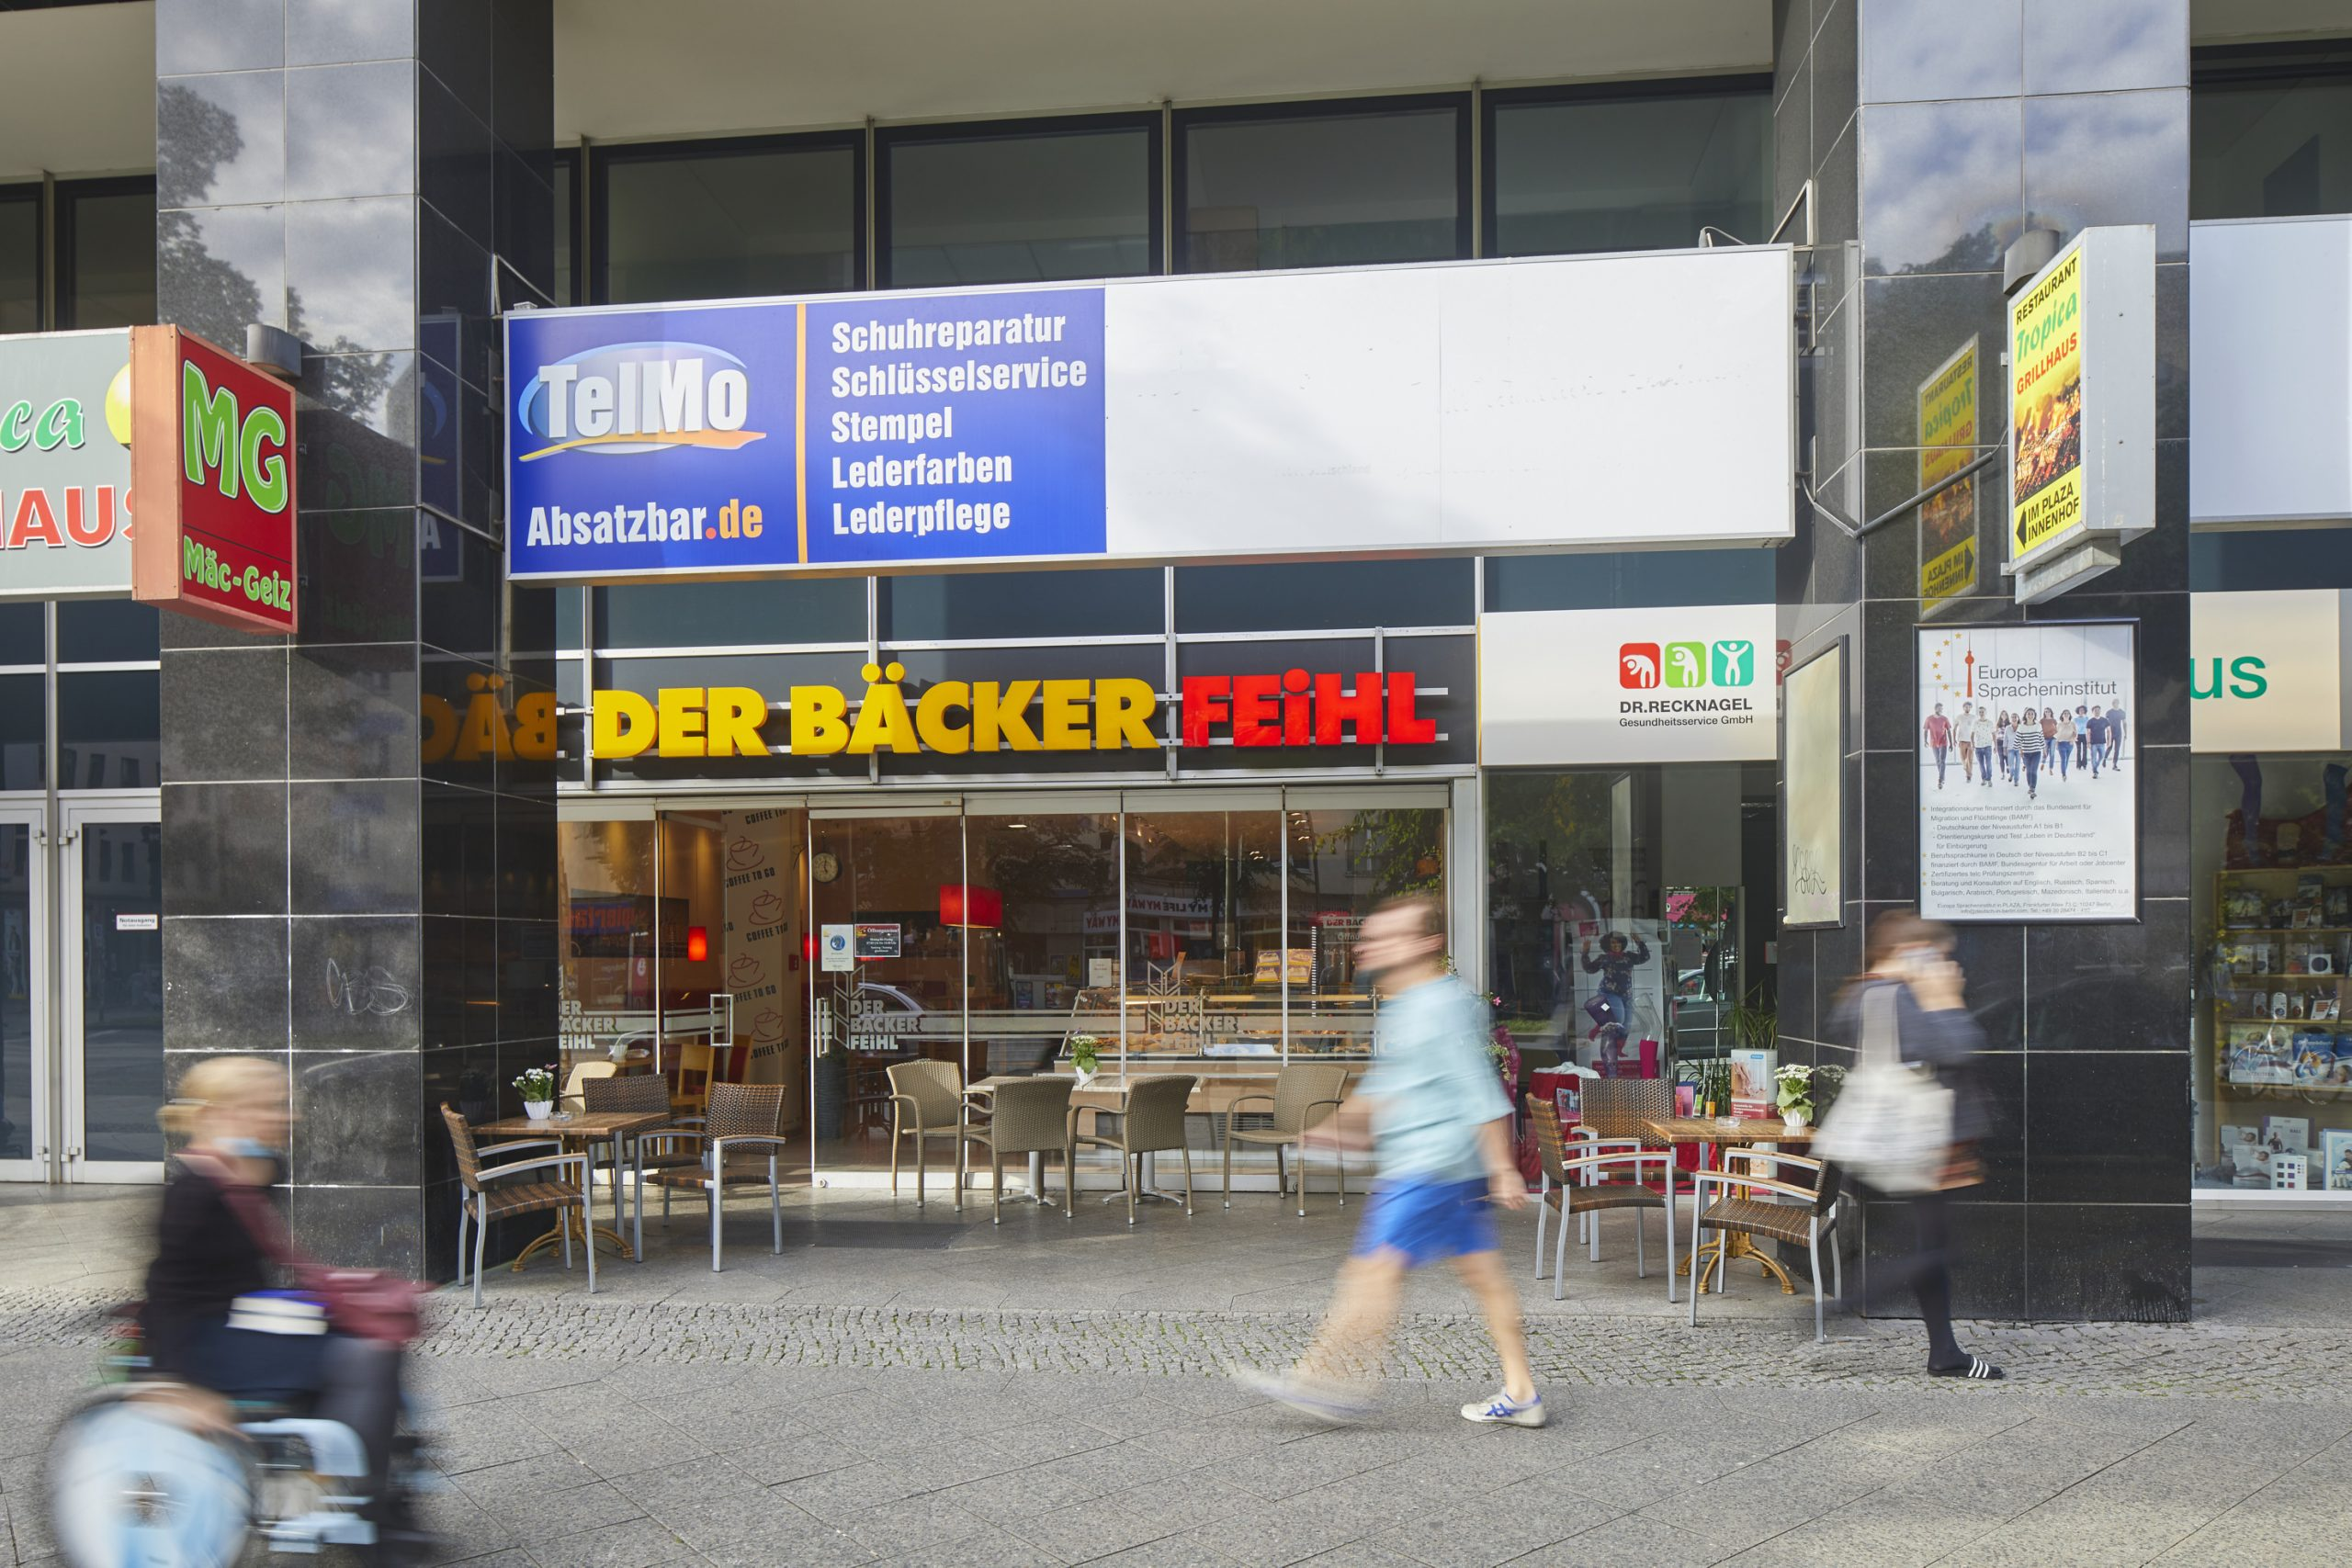 Eingang der Baekerei Feihl im Plaza Frankfurter Allee in Berlin